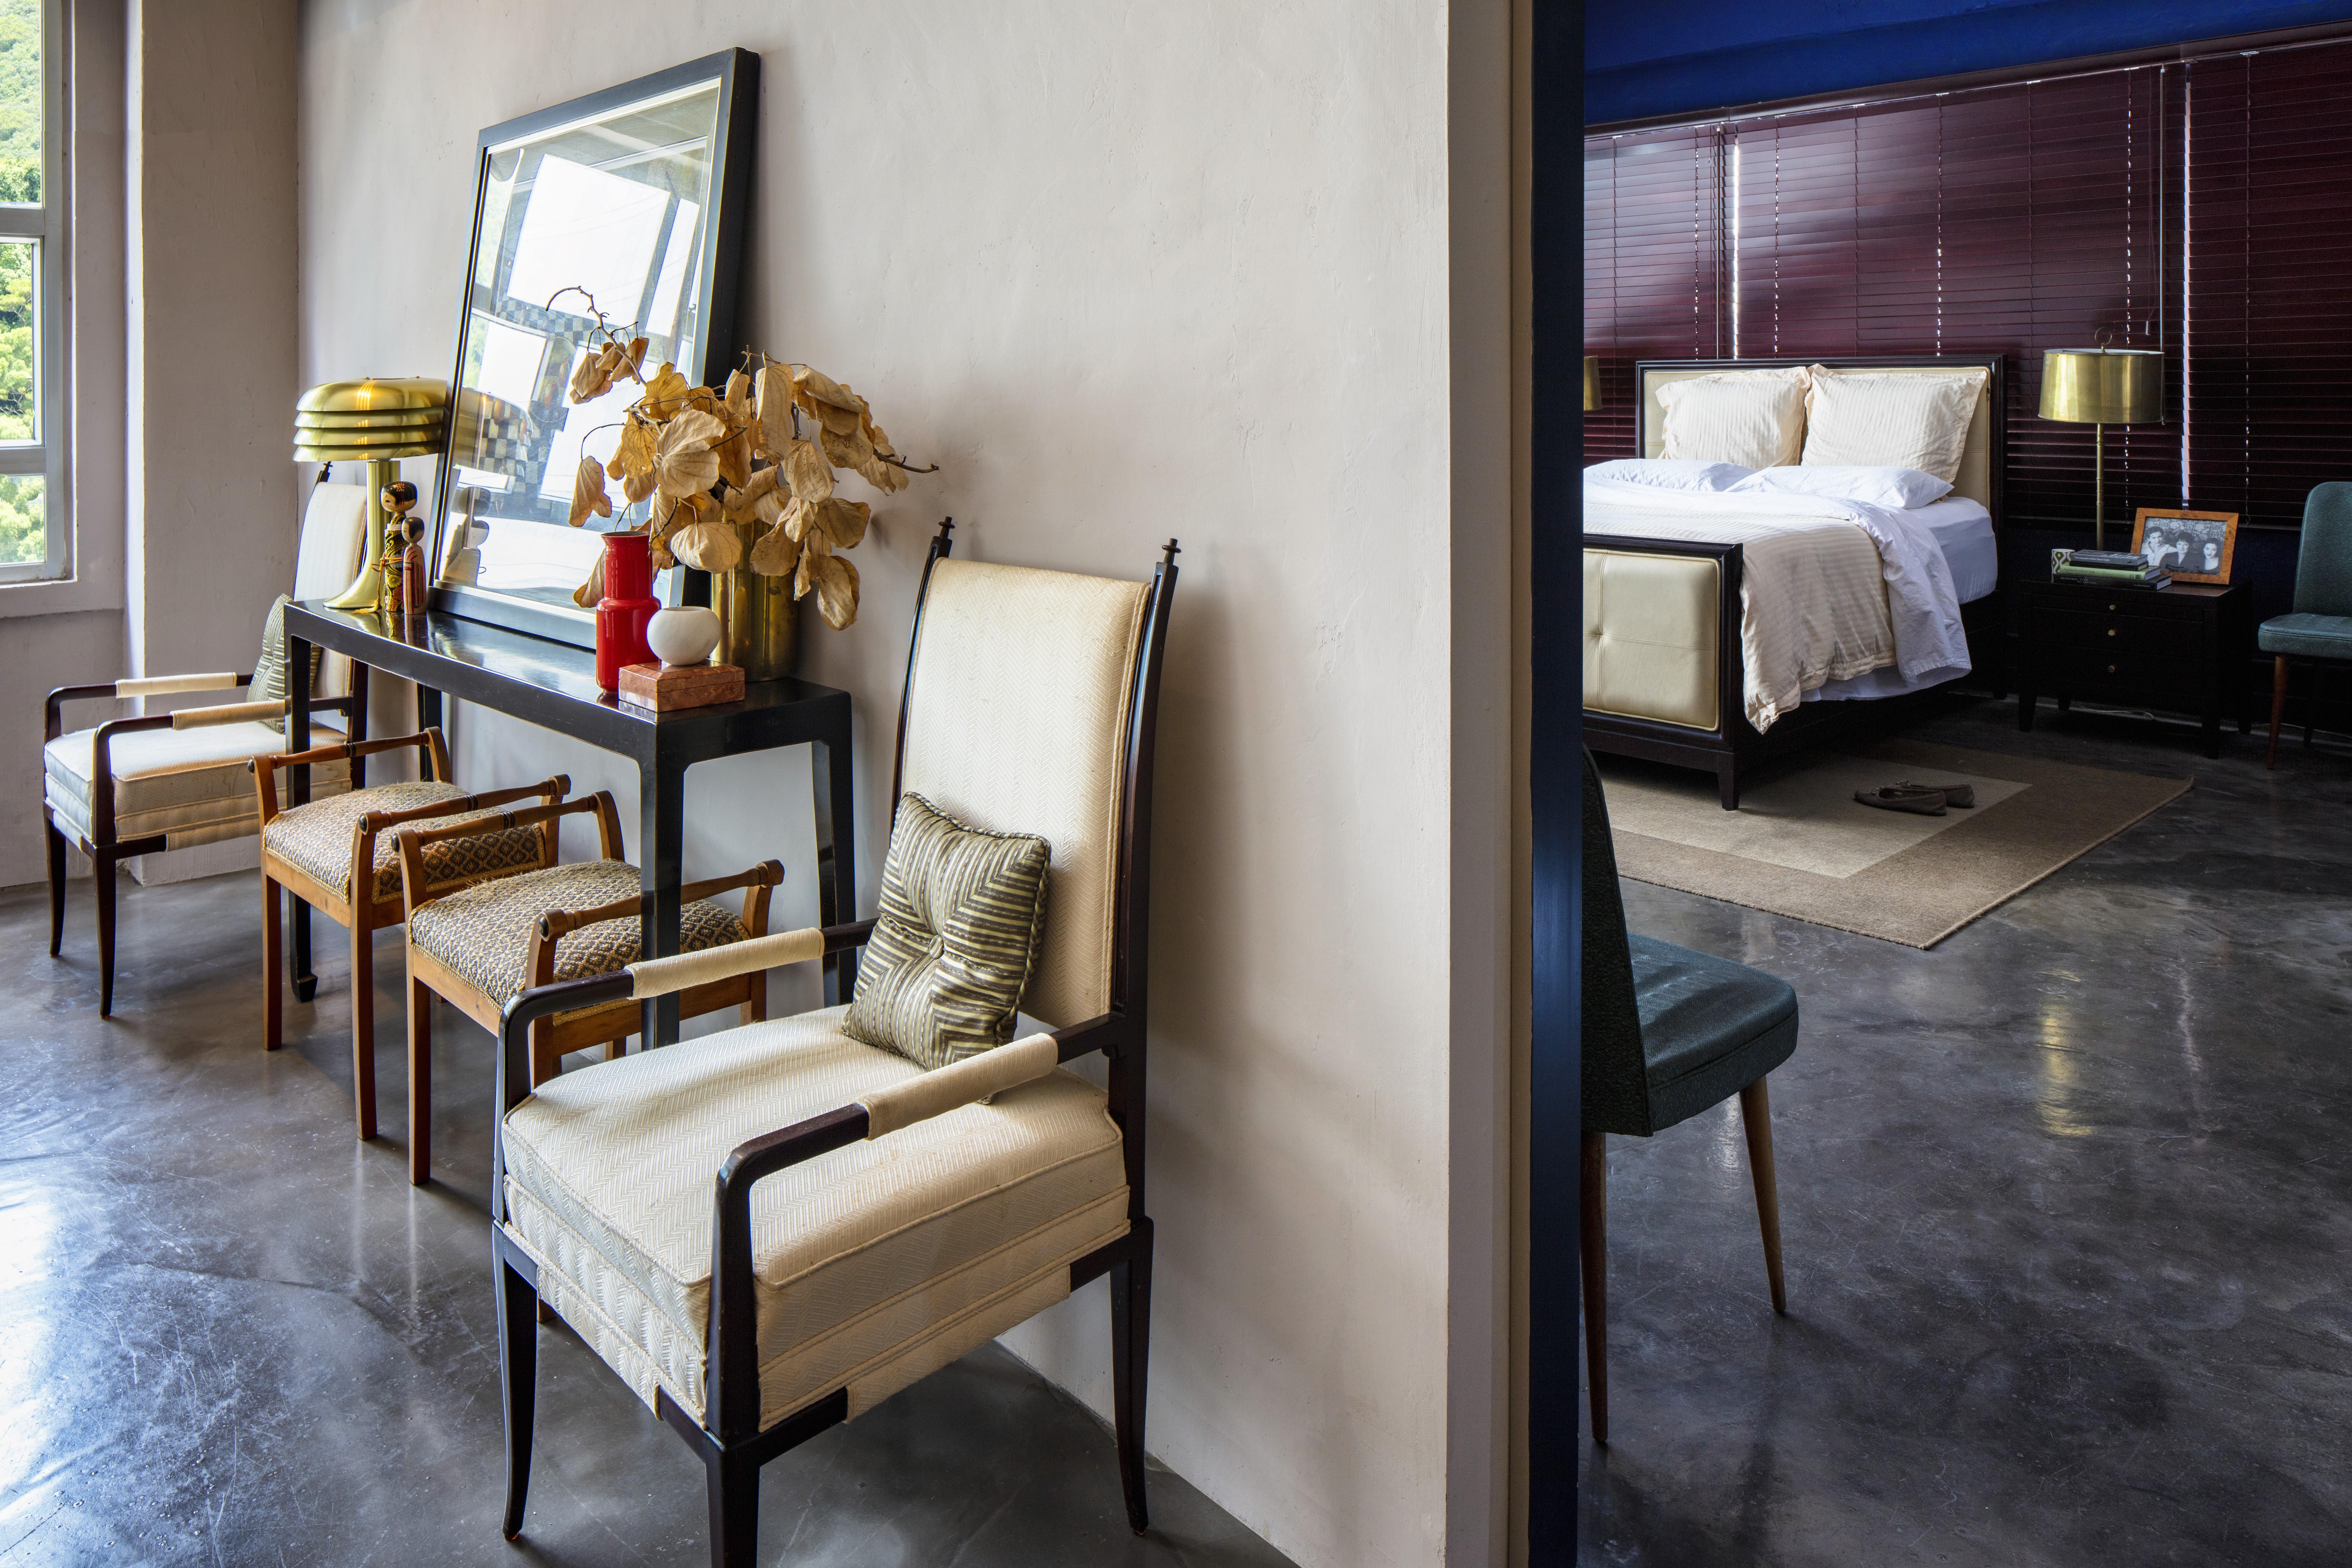 Hong Kong Interior Designer Recreates Cosy Vibe In Move To